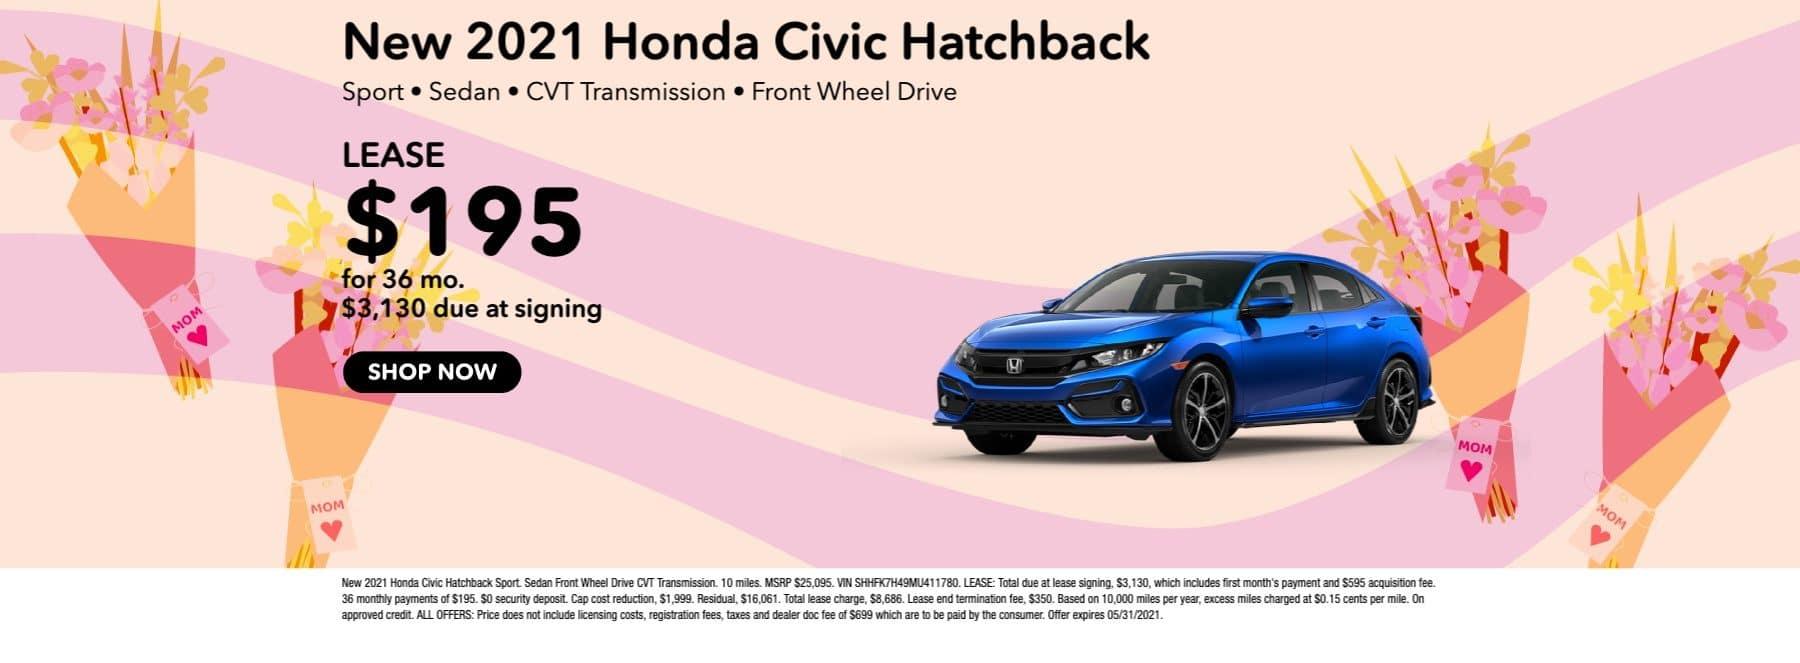 New 2021 Honda Civic Hatchback